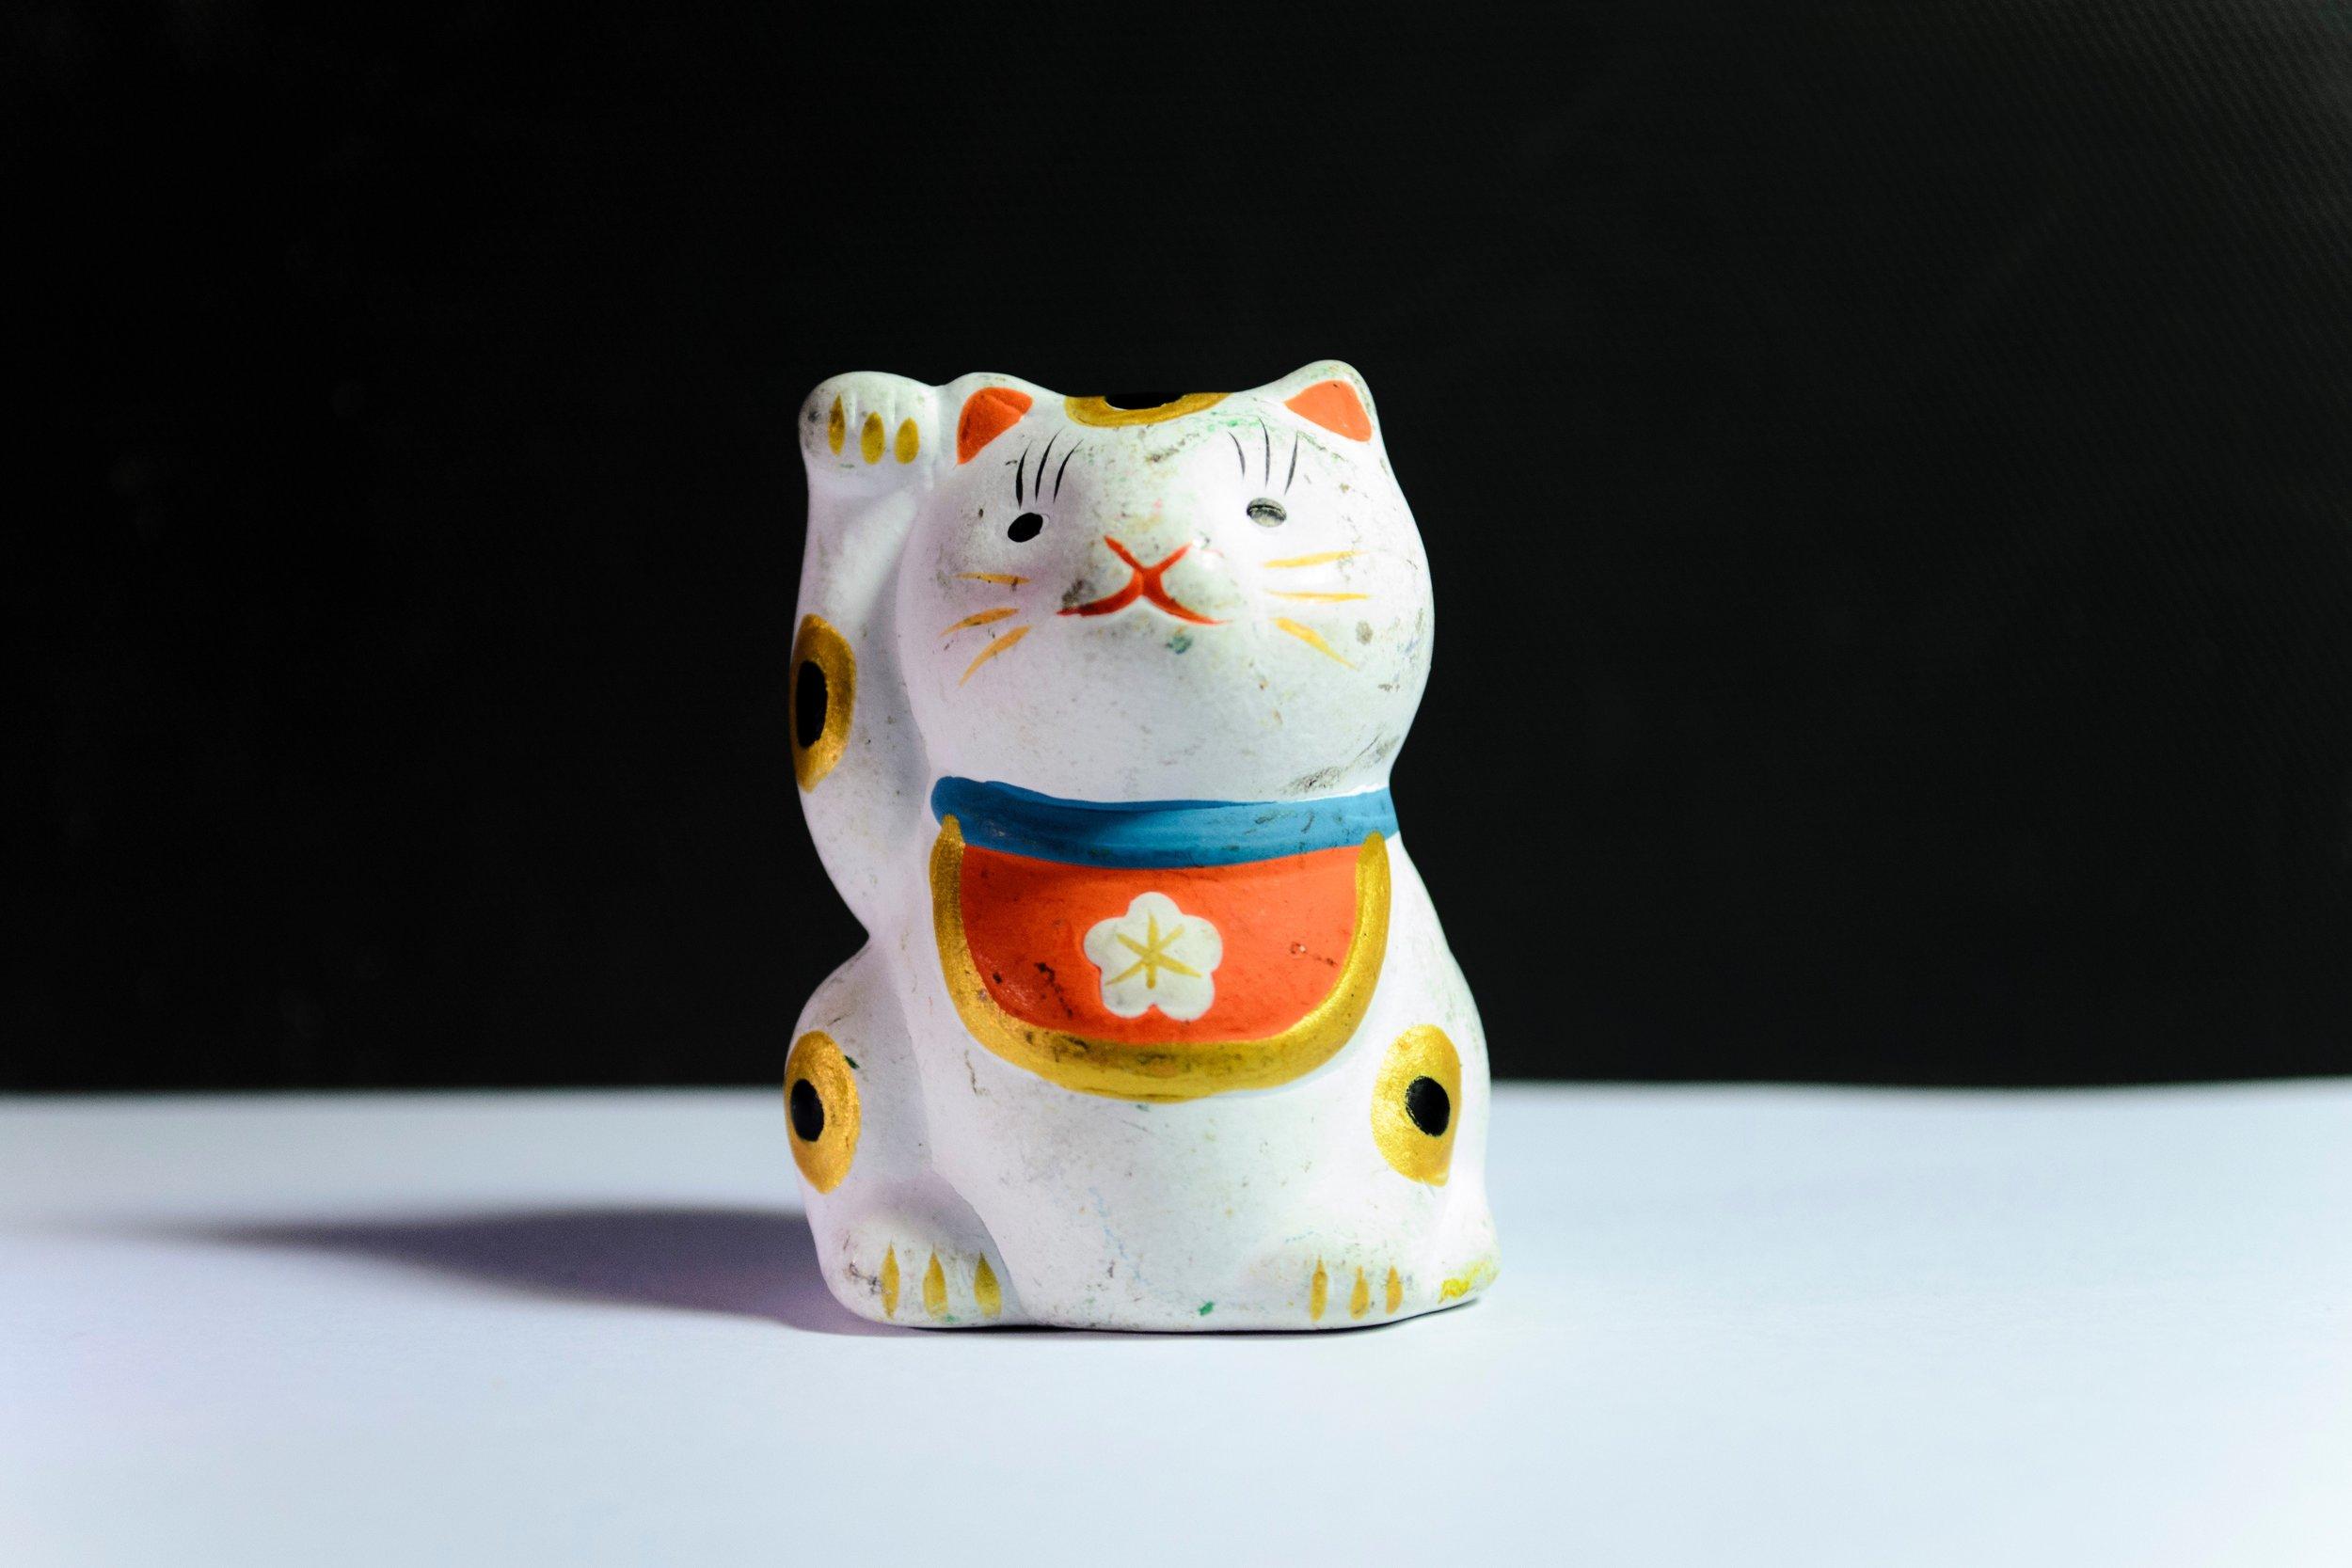 cat-charm-doll-1717673.jpg